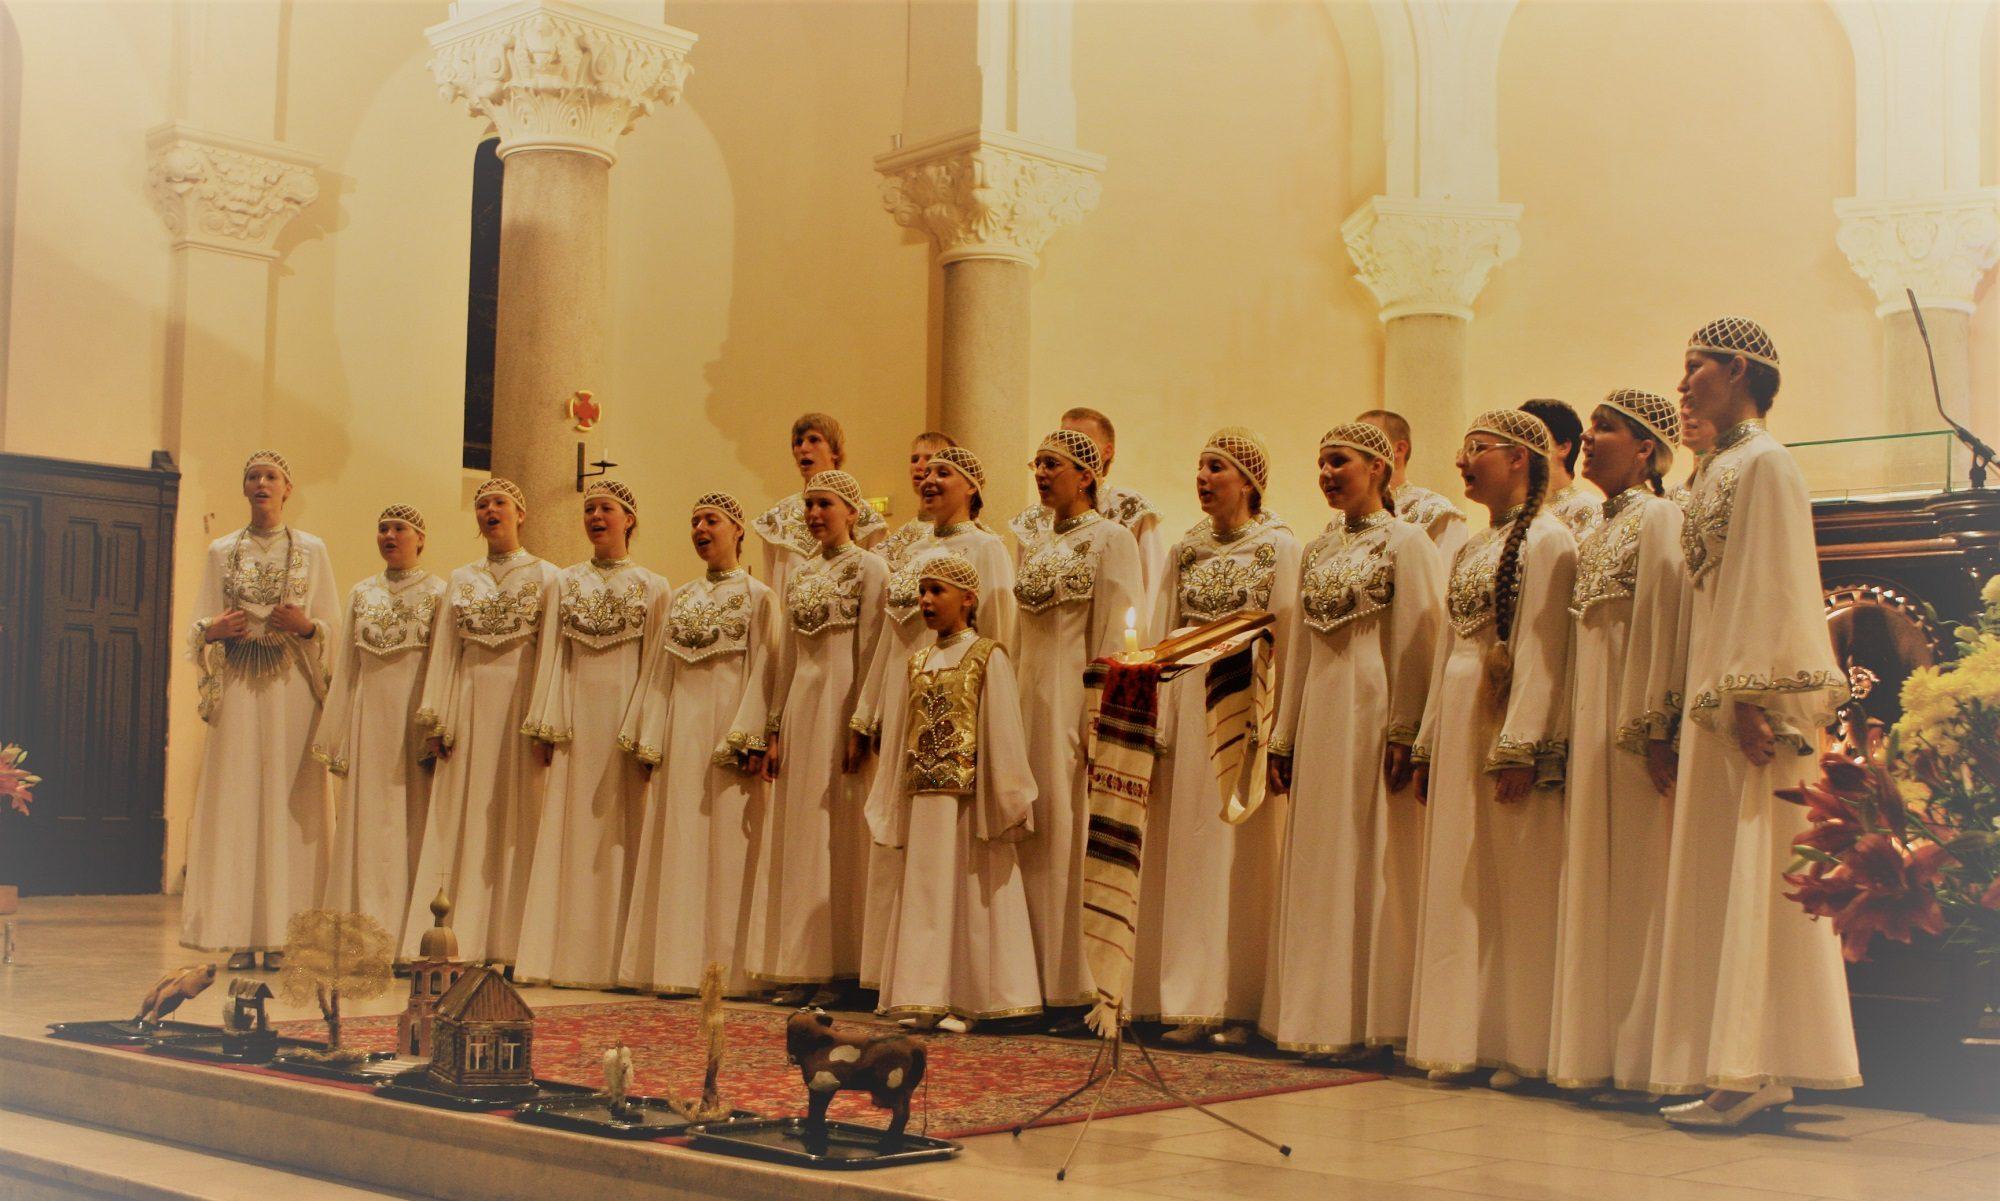 Forum des chorales des peuples eurasiens